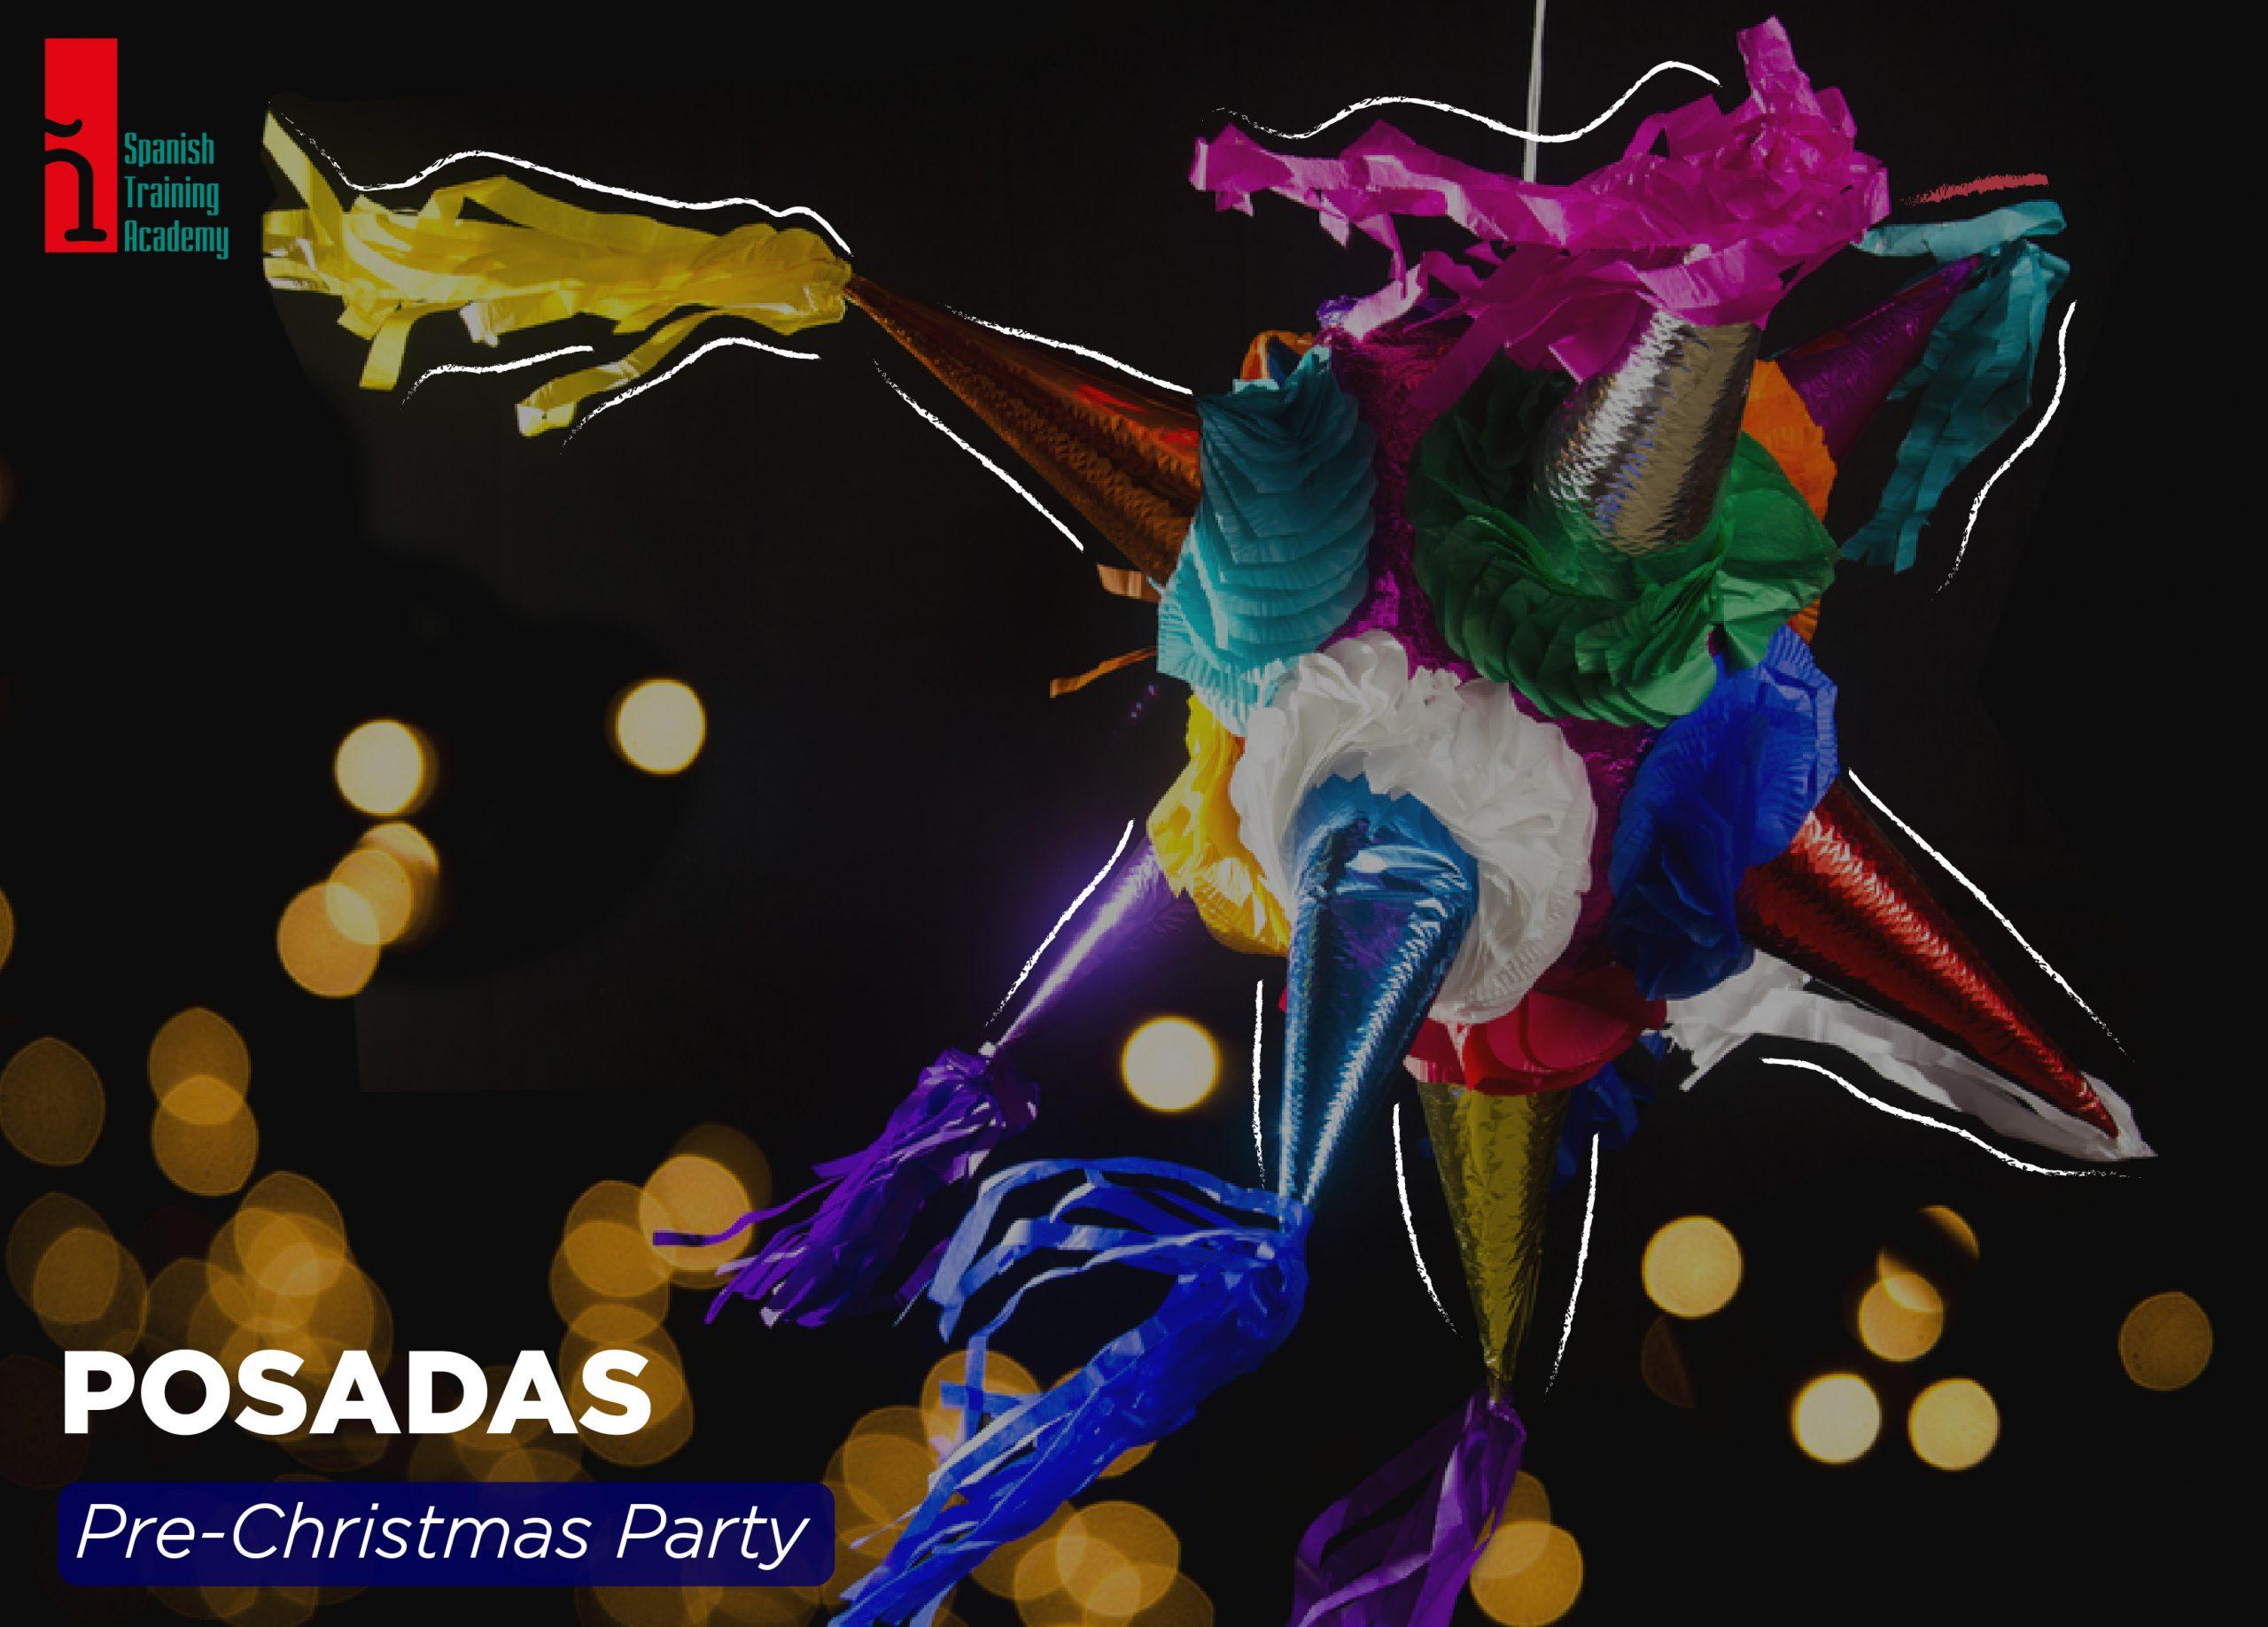 posadas party